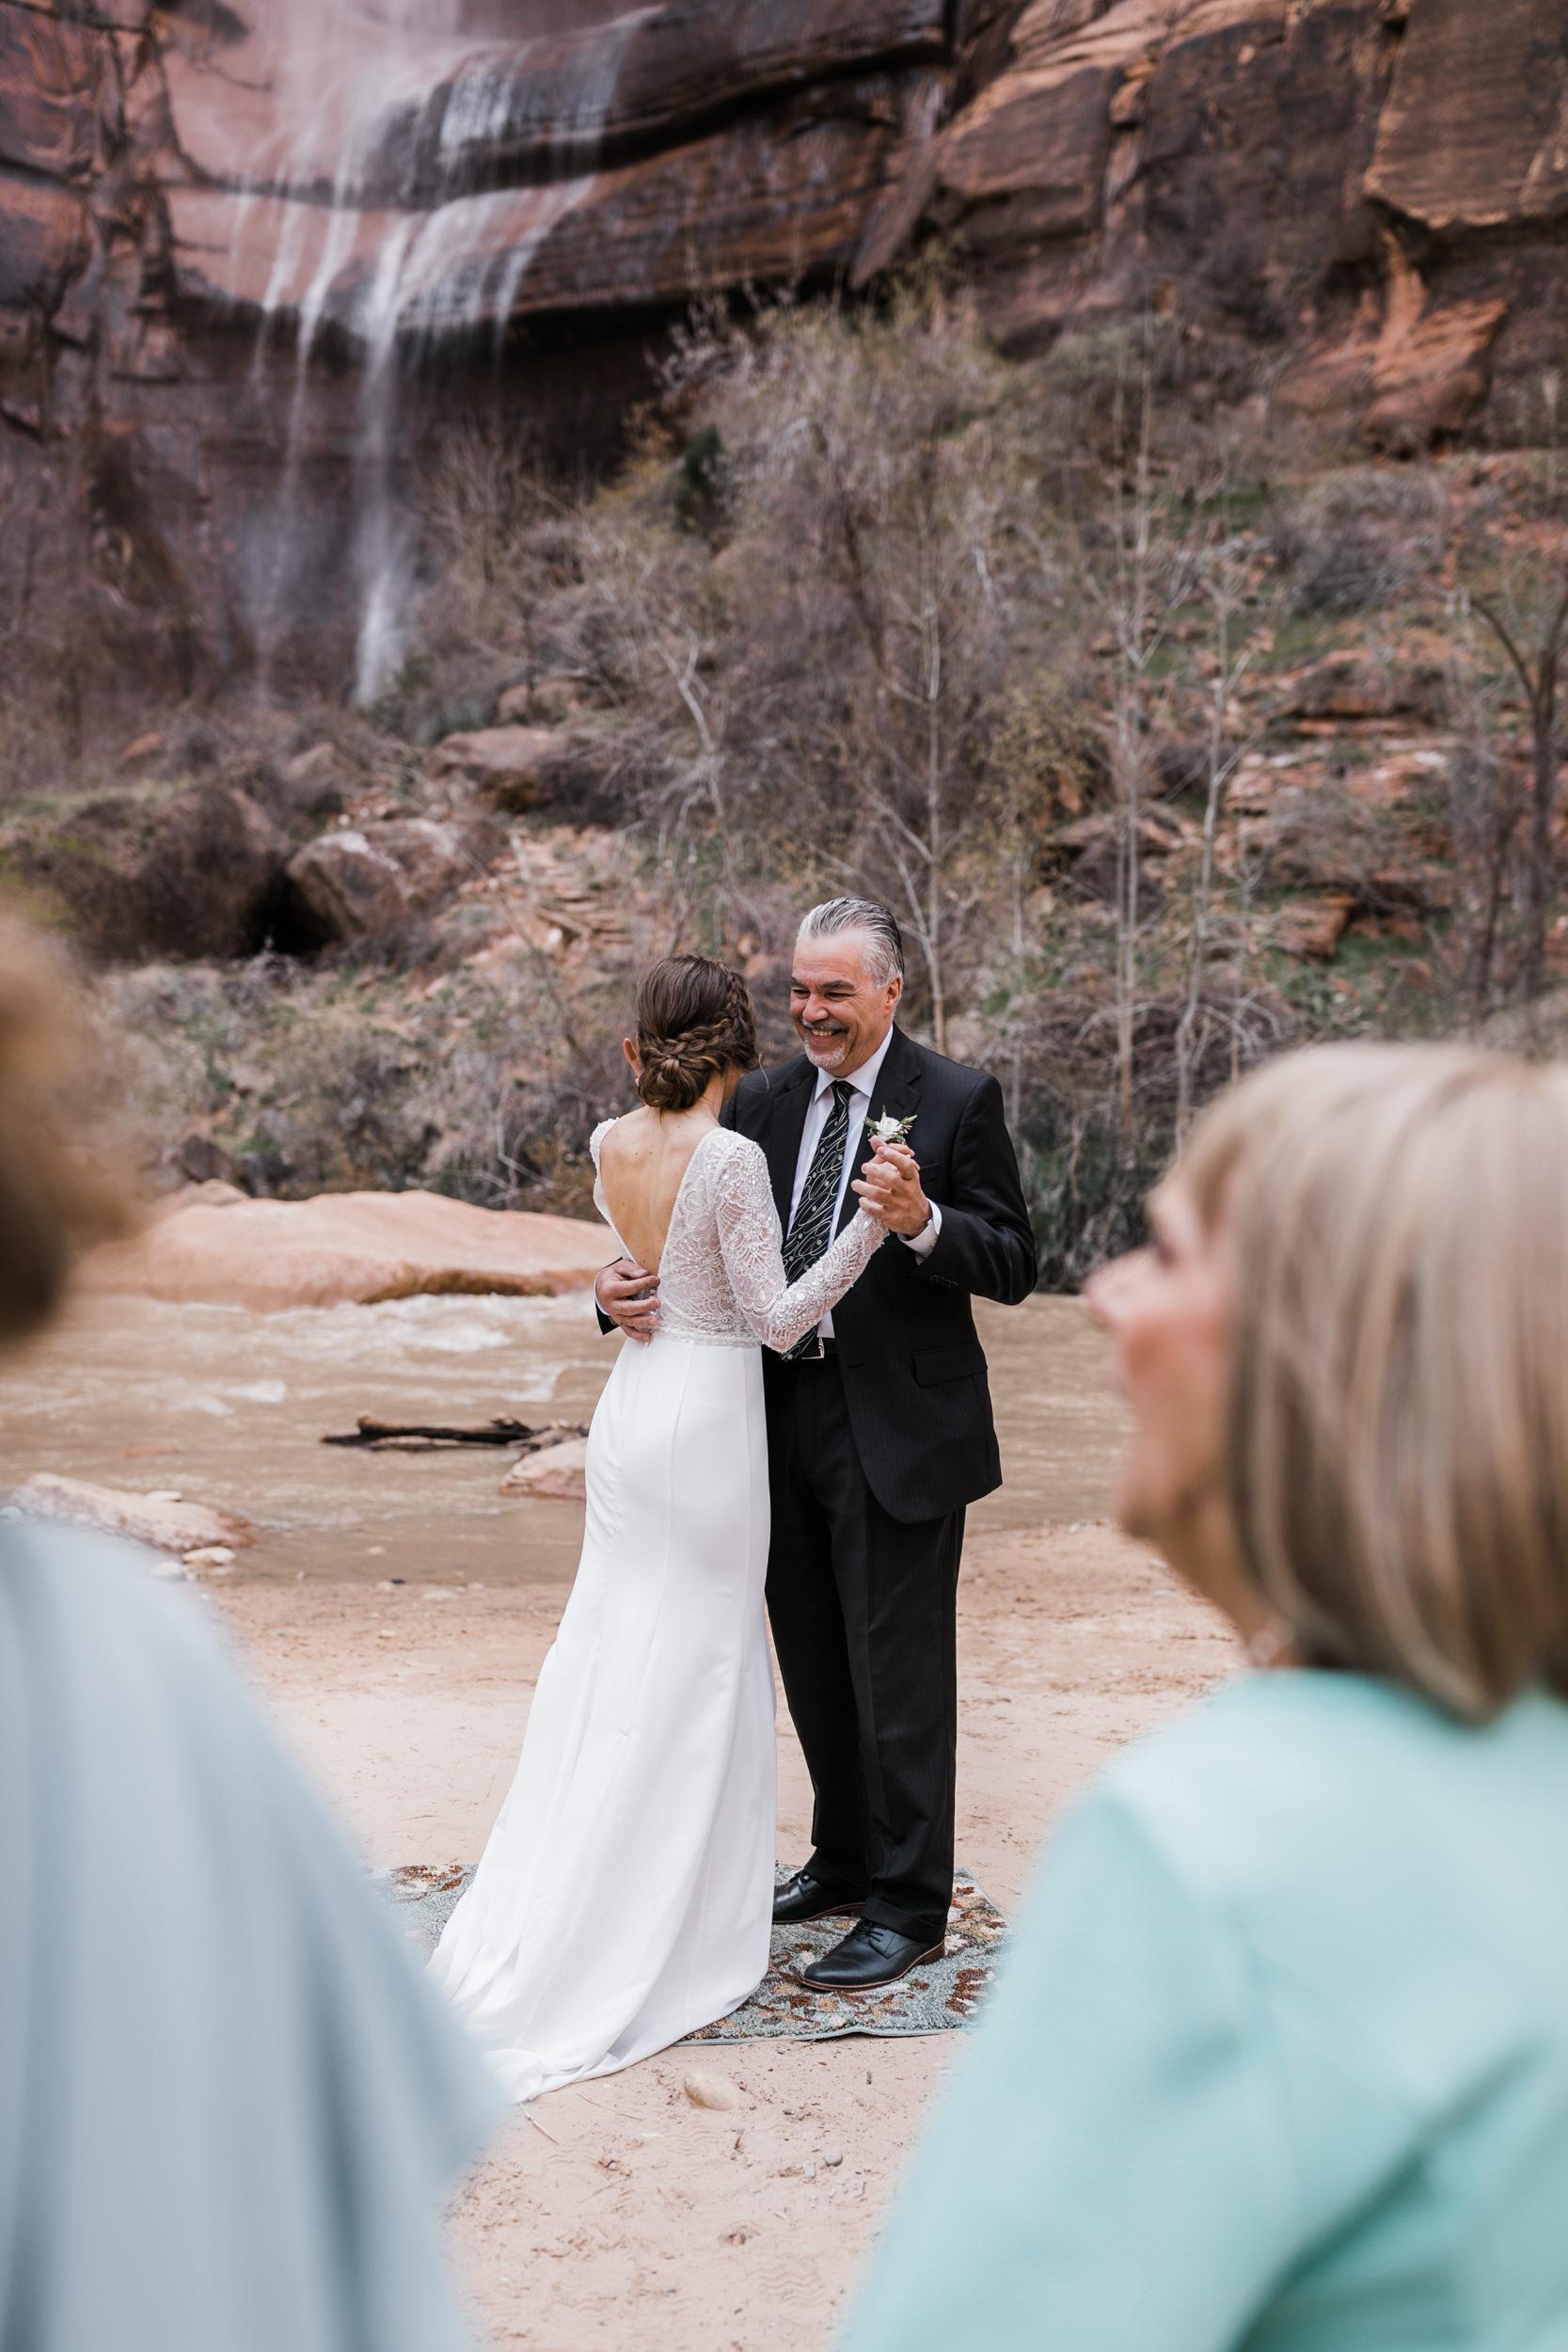 Zion-National-Park-Adventure-Wedding-Hearnes-Elopement-Photography-17.jpg